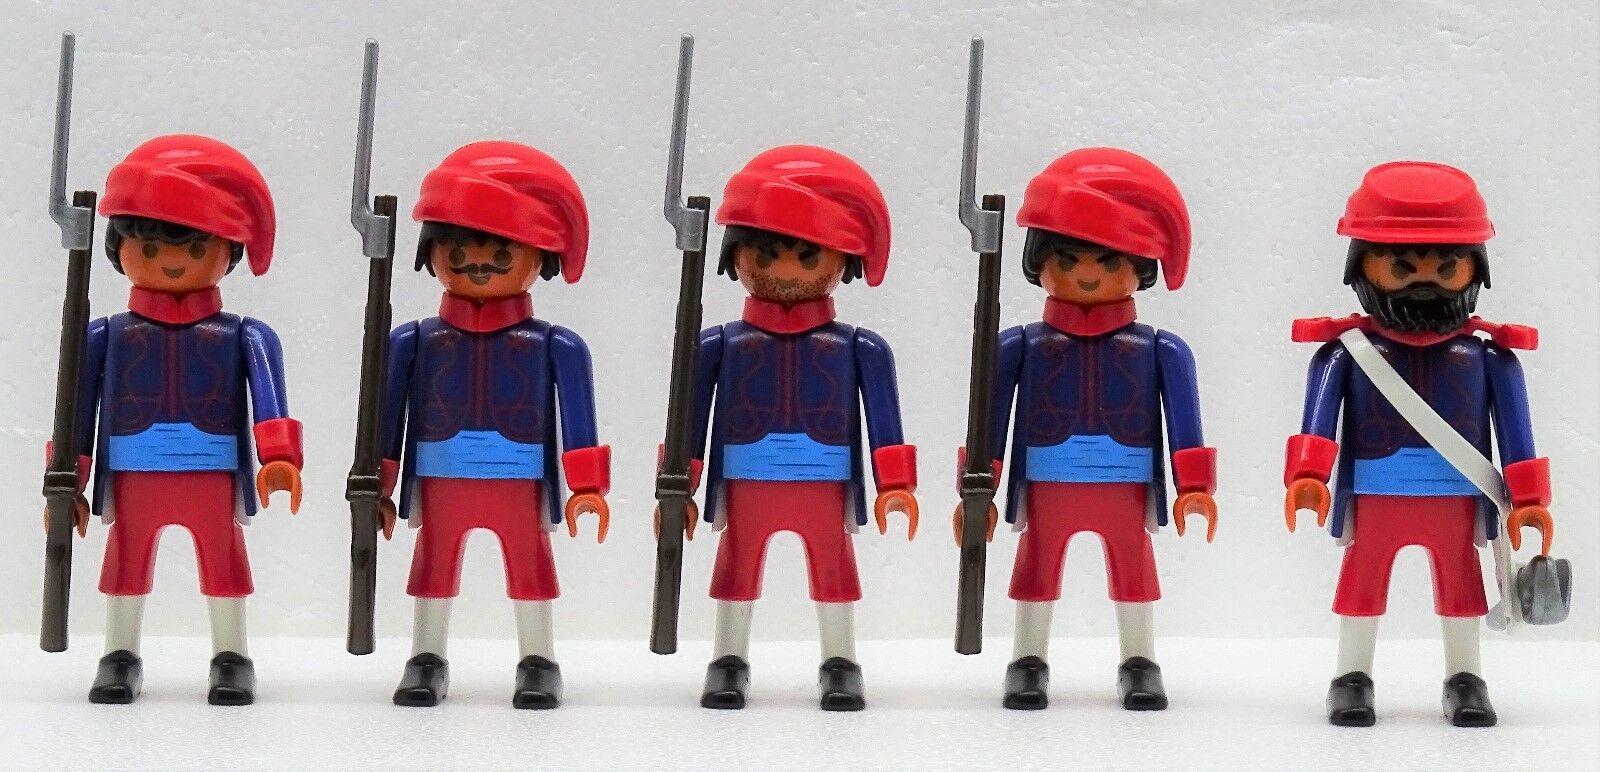 Zouave 4 SOLDATS SOLDATS SOLDATS + Officier C Playmobil citoyen du Nord contre sudistes ACW a0ef1c